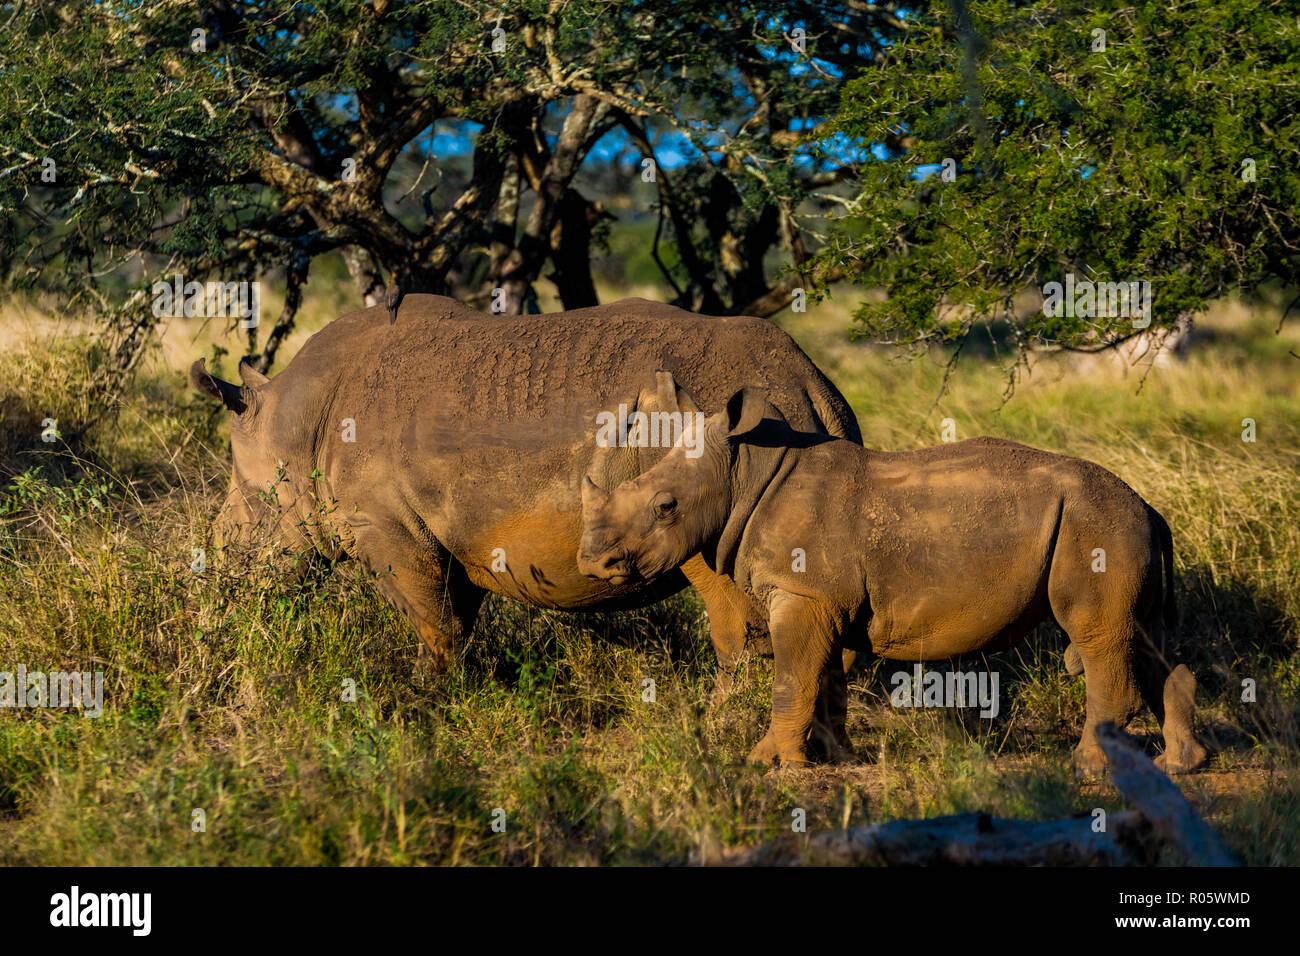 Rhinoceros (Rhinocerotidae), Zululand, South Africa, Africa - Stock Image